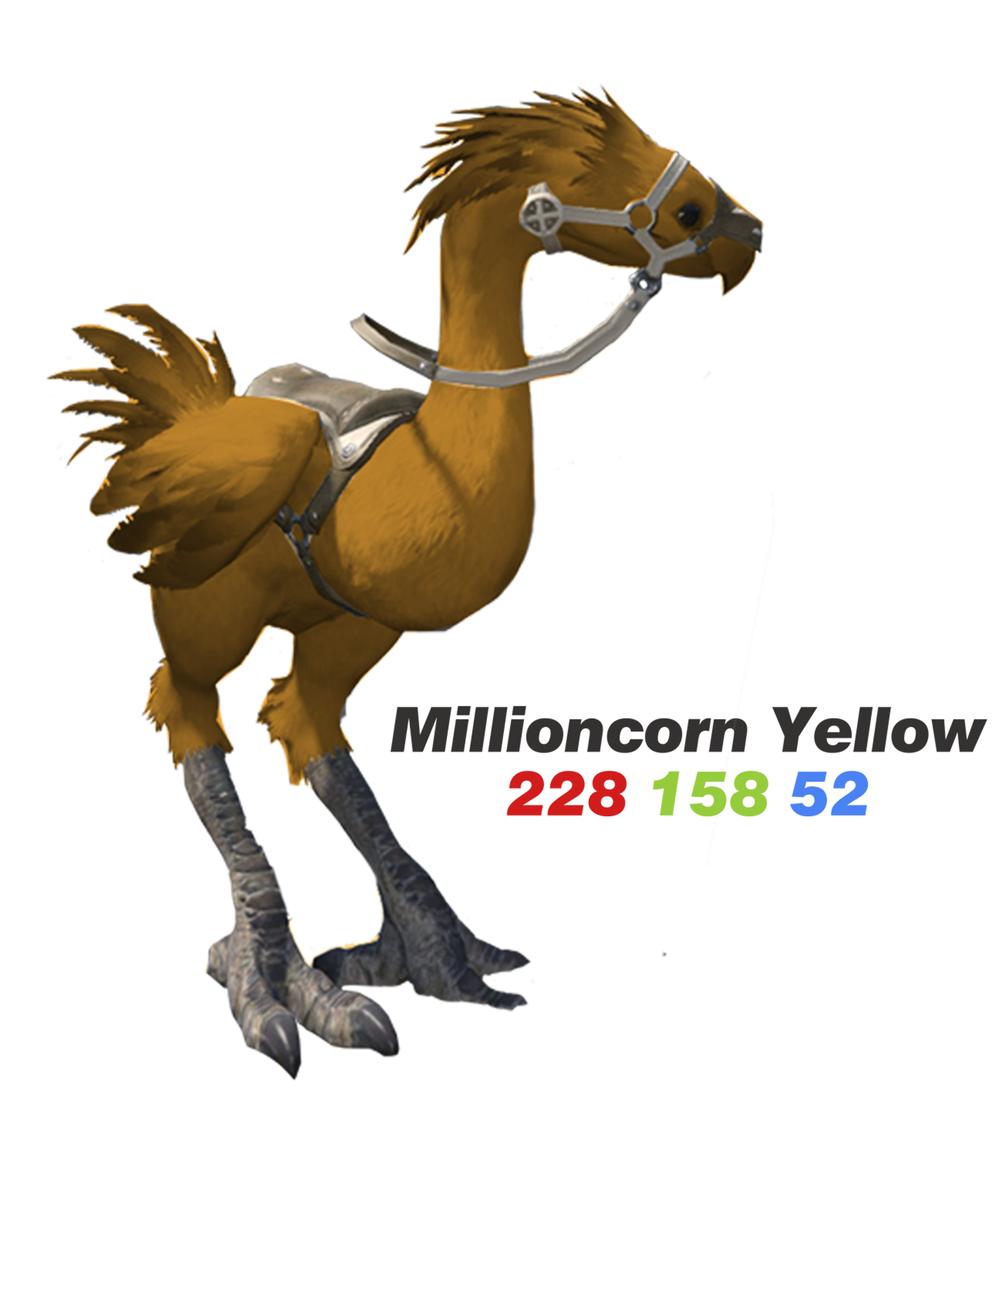 MilliYellow.png